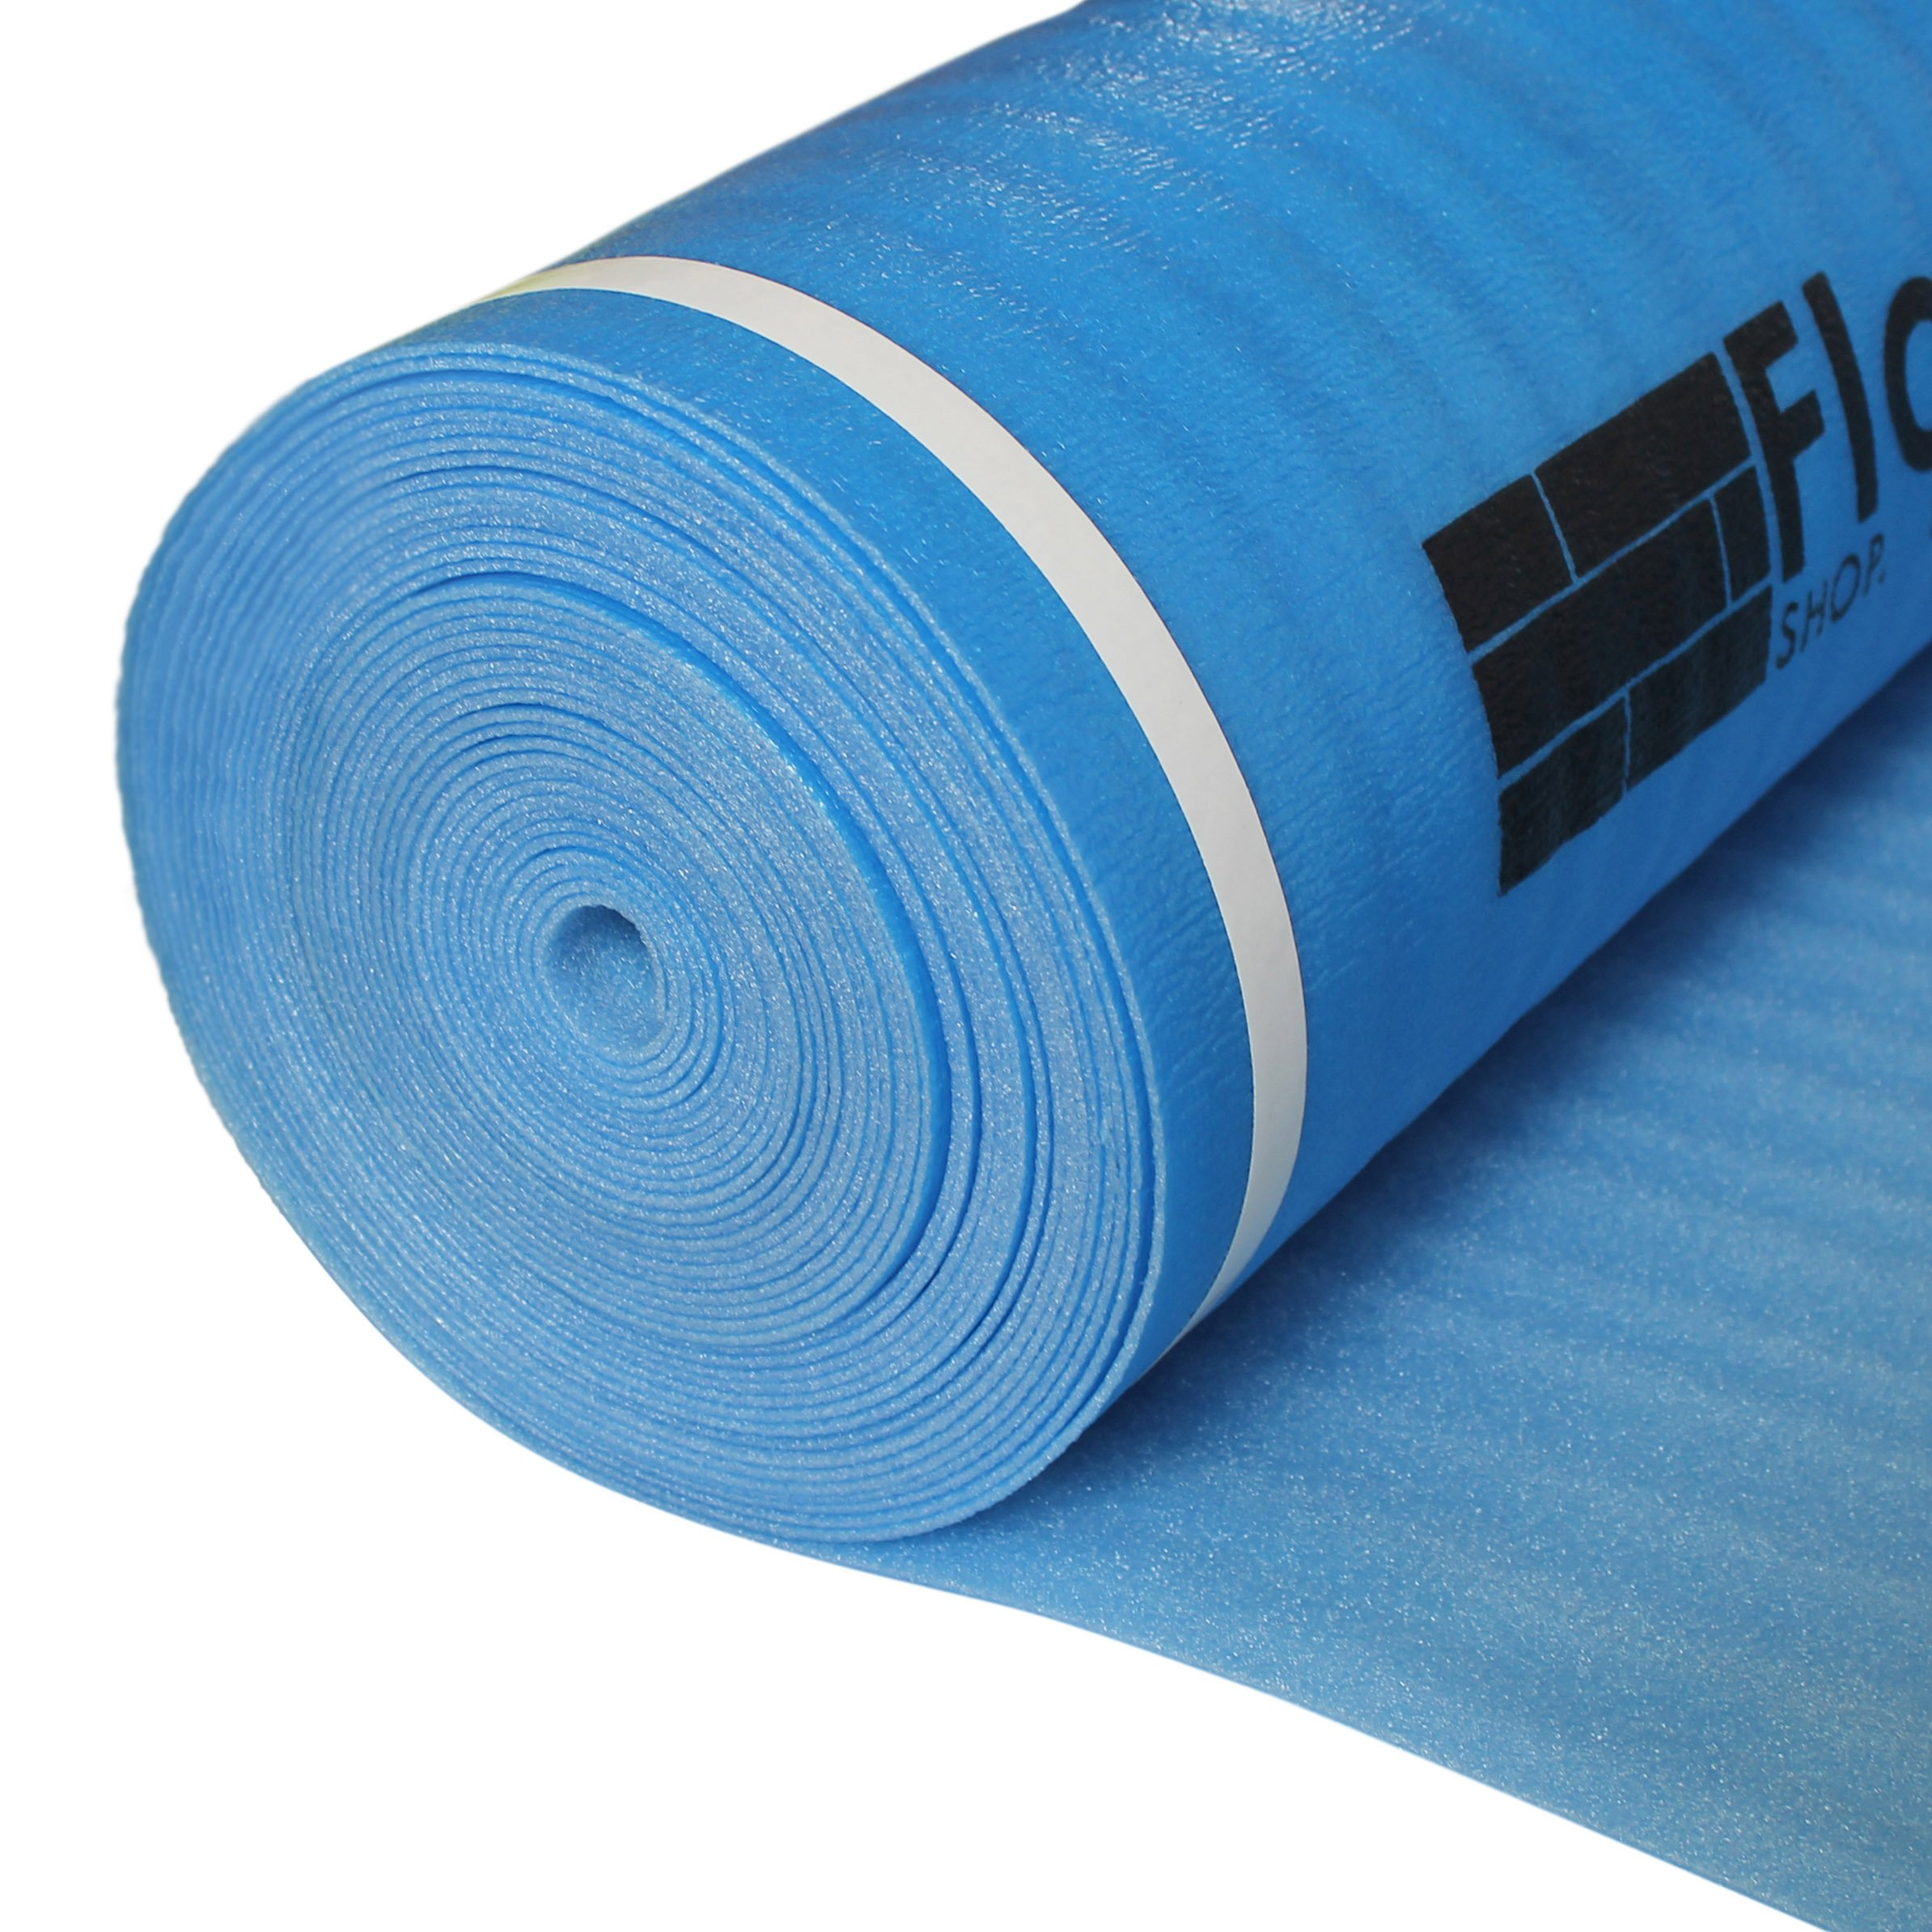 FLOORLOT SHOP. FLOORS. DELIVERED. 200sqft 3mm Laminate Flooring Underlayment with Vapor Barrier